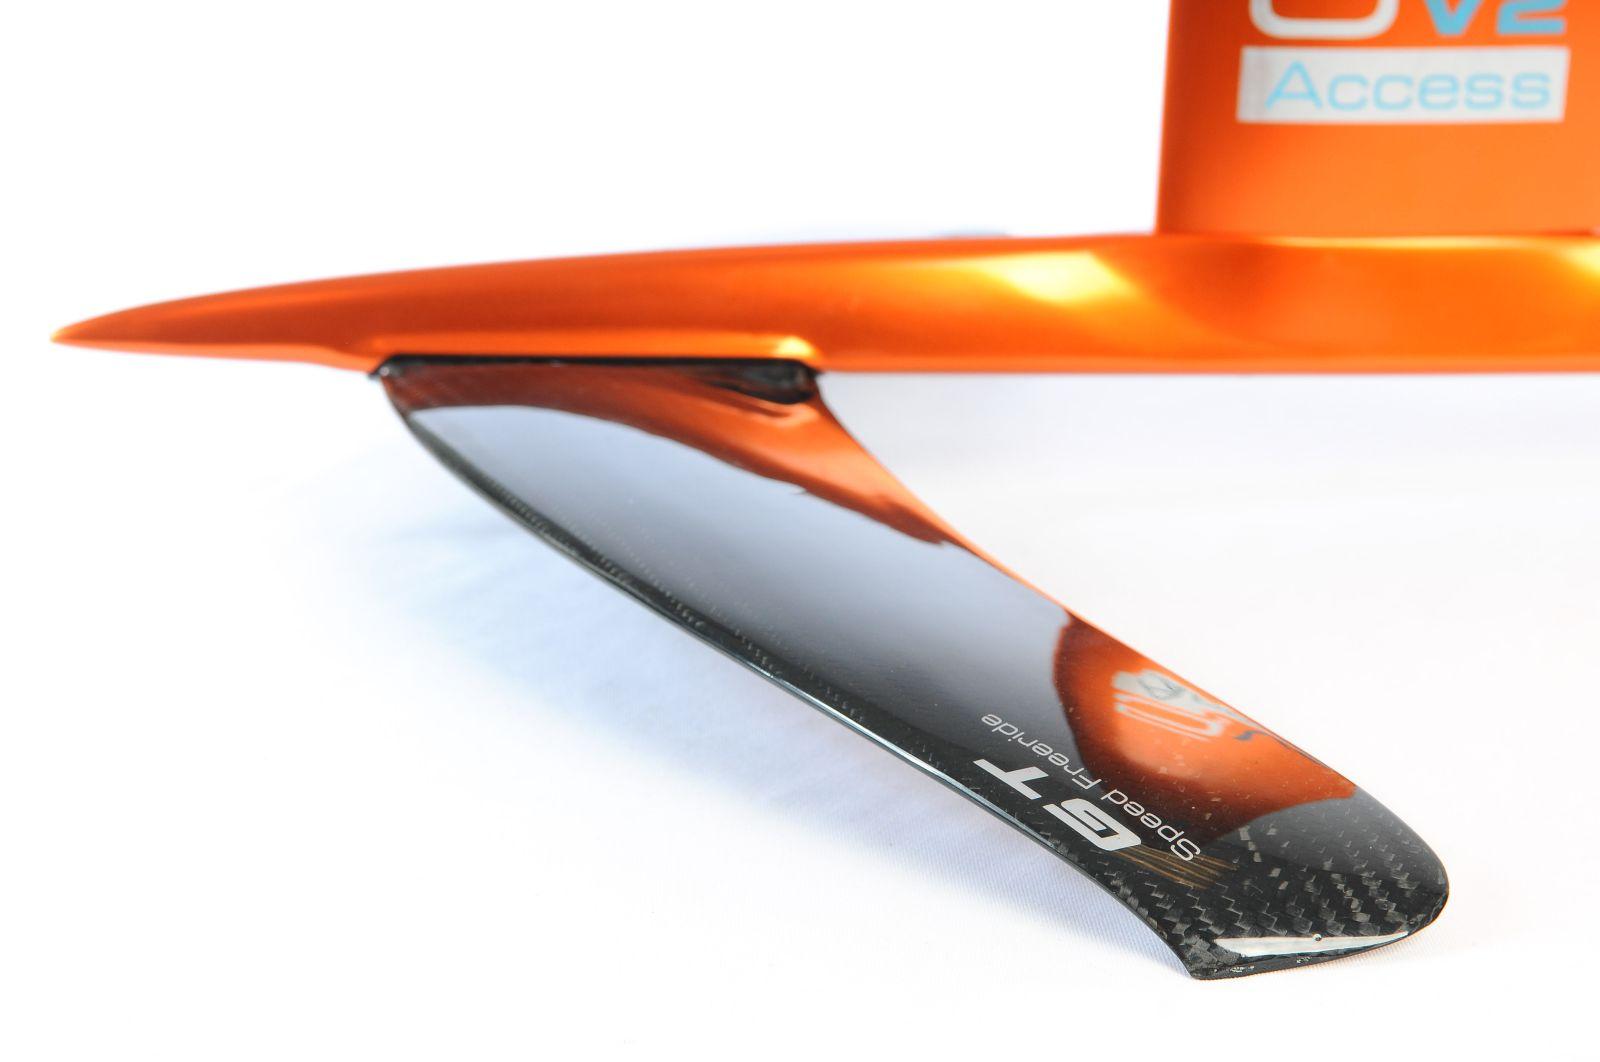 Kitefoil carbon aluminium alpinefoil 5 0 access v2 2559 1